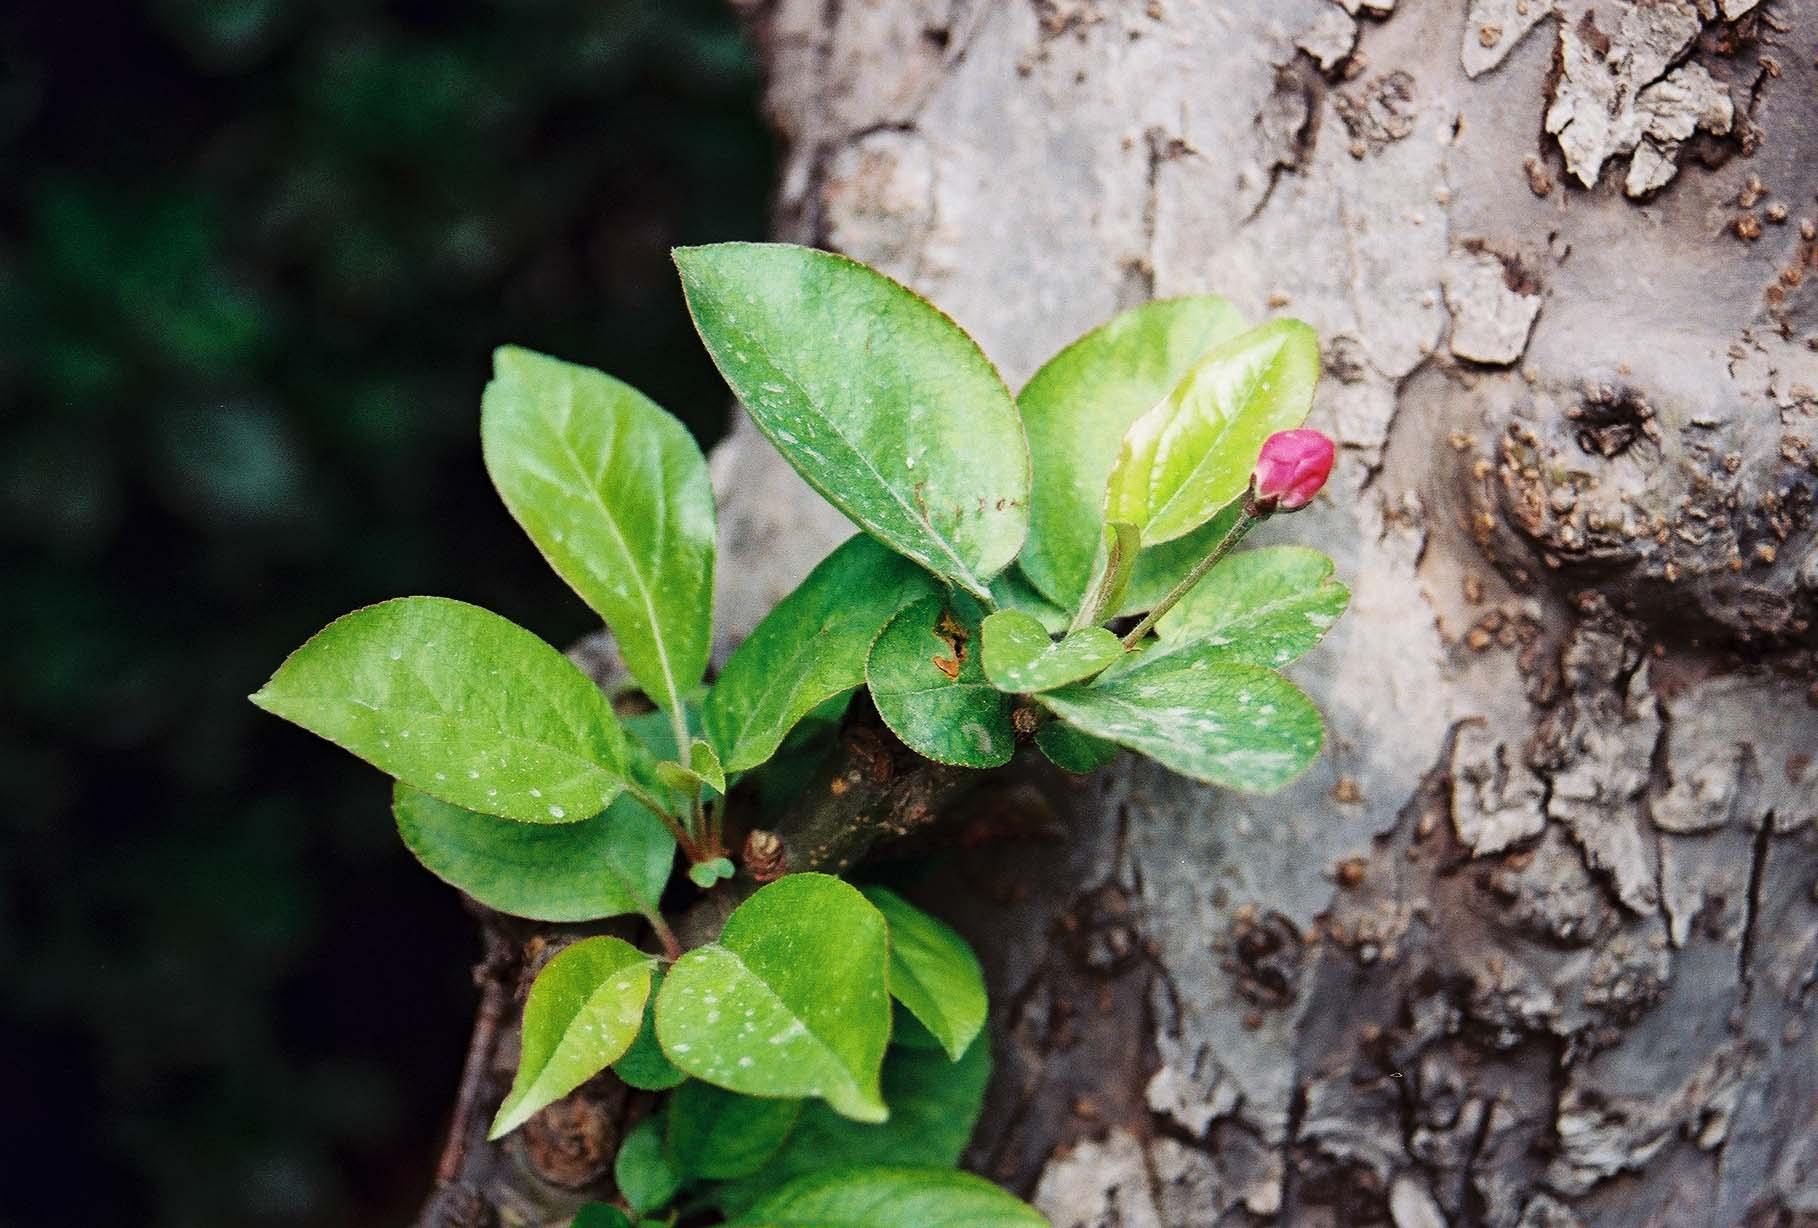 weseeflower作品:春 海棠